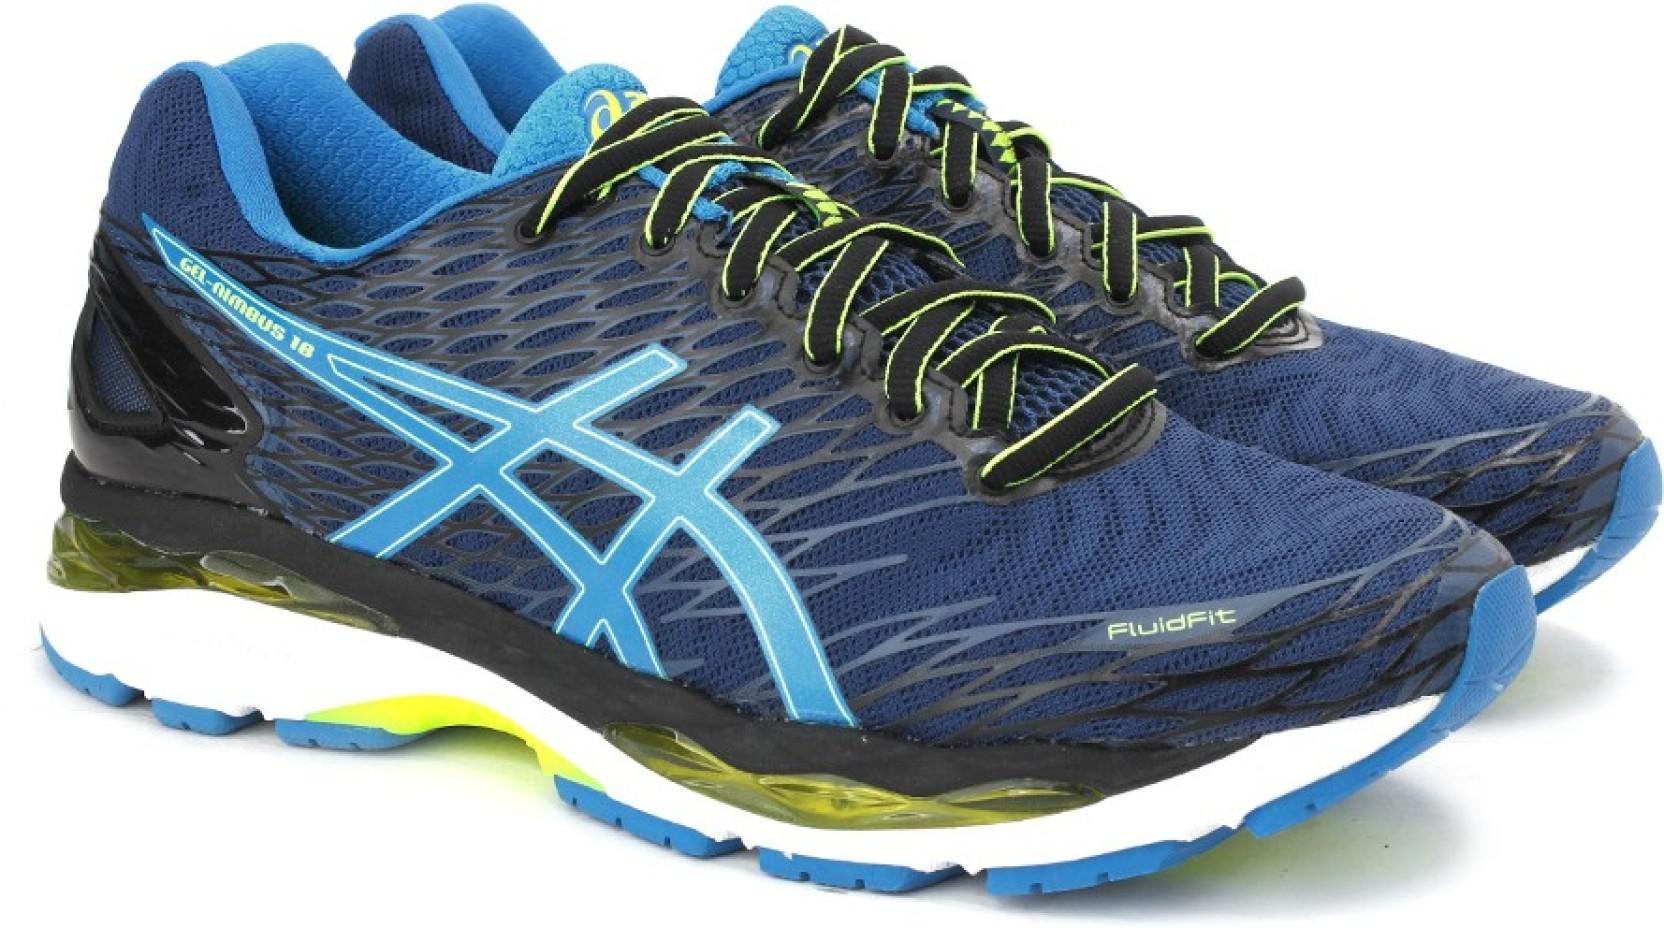 aac93c9747e Asics GEL-NIMBUS 18 Running Shoes For Men